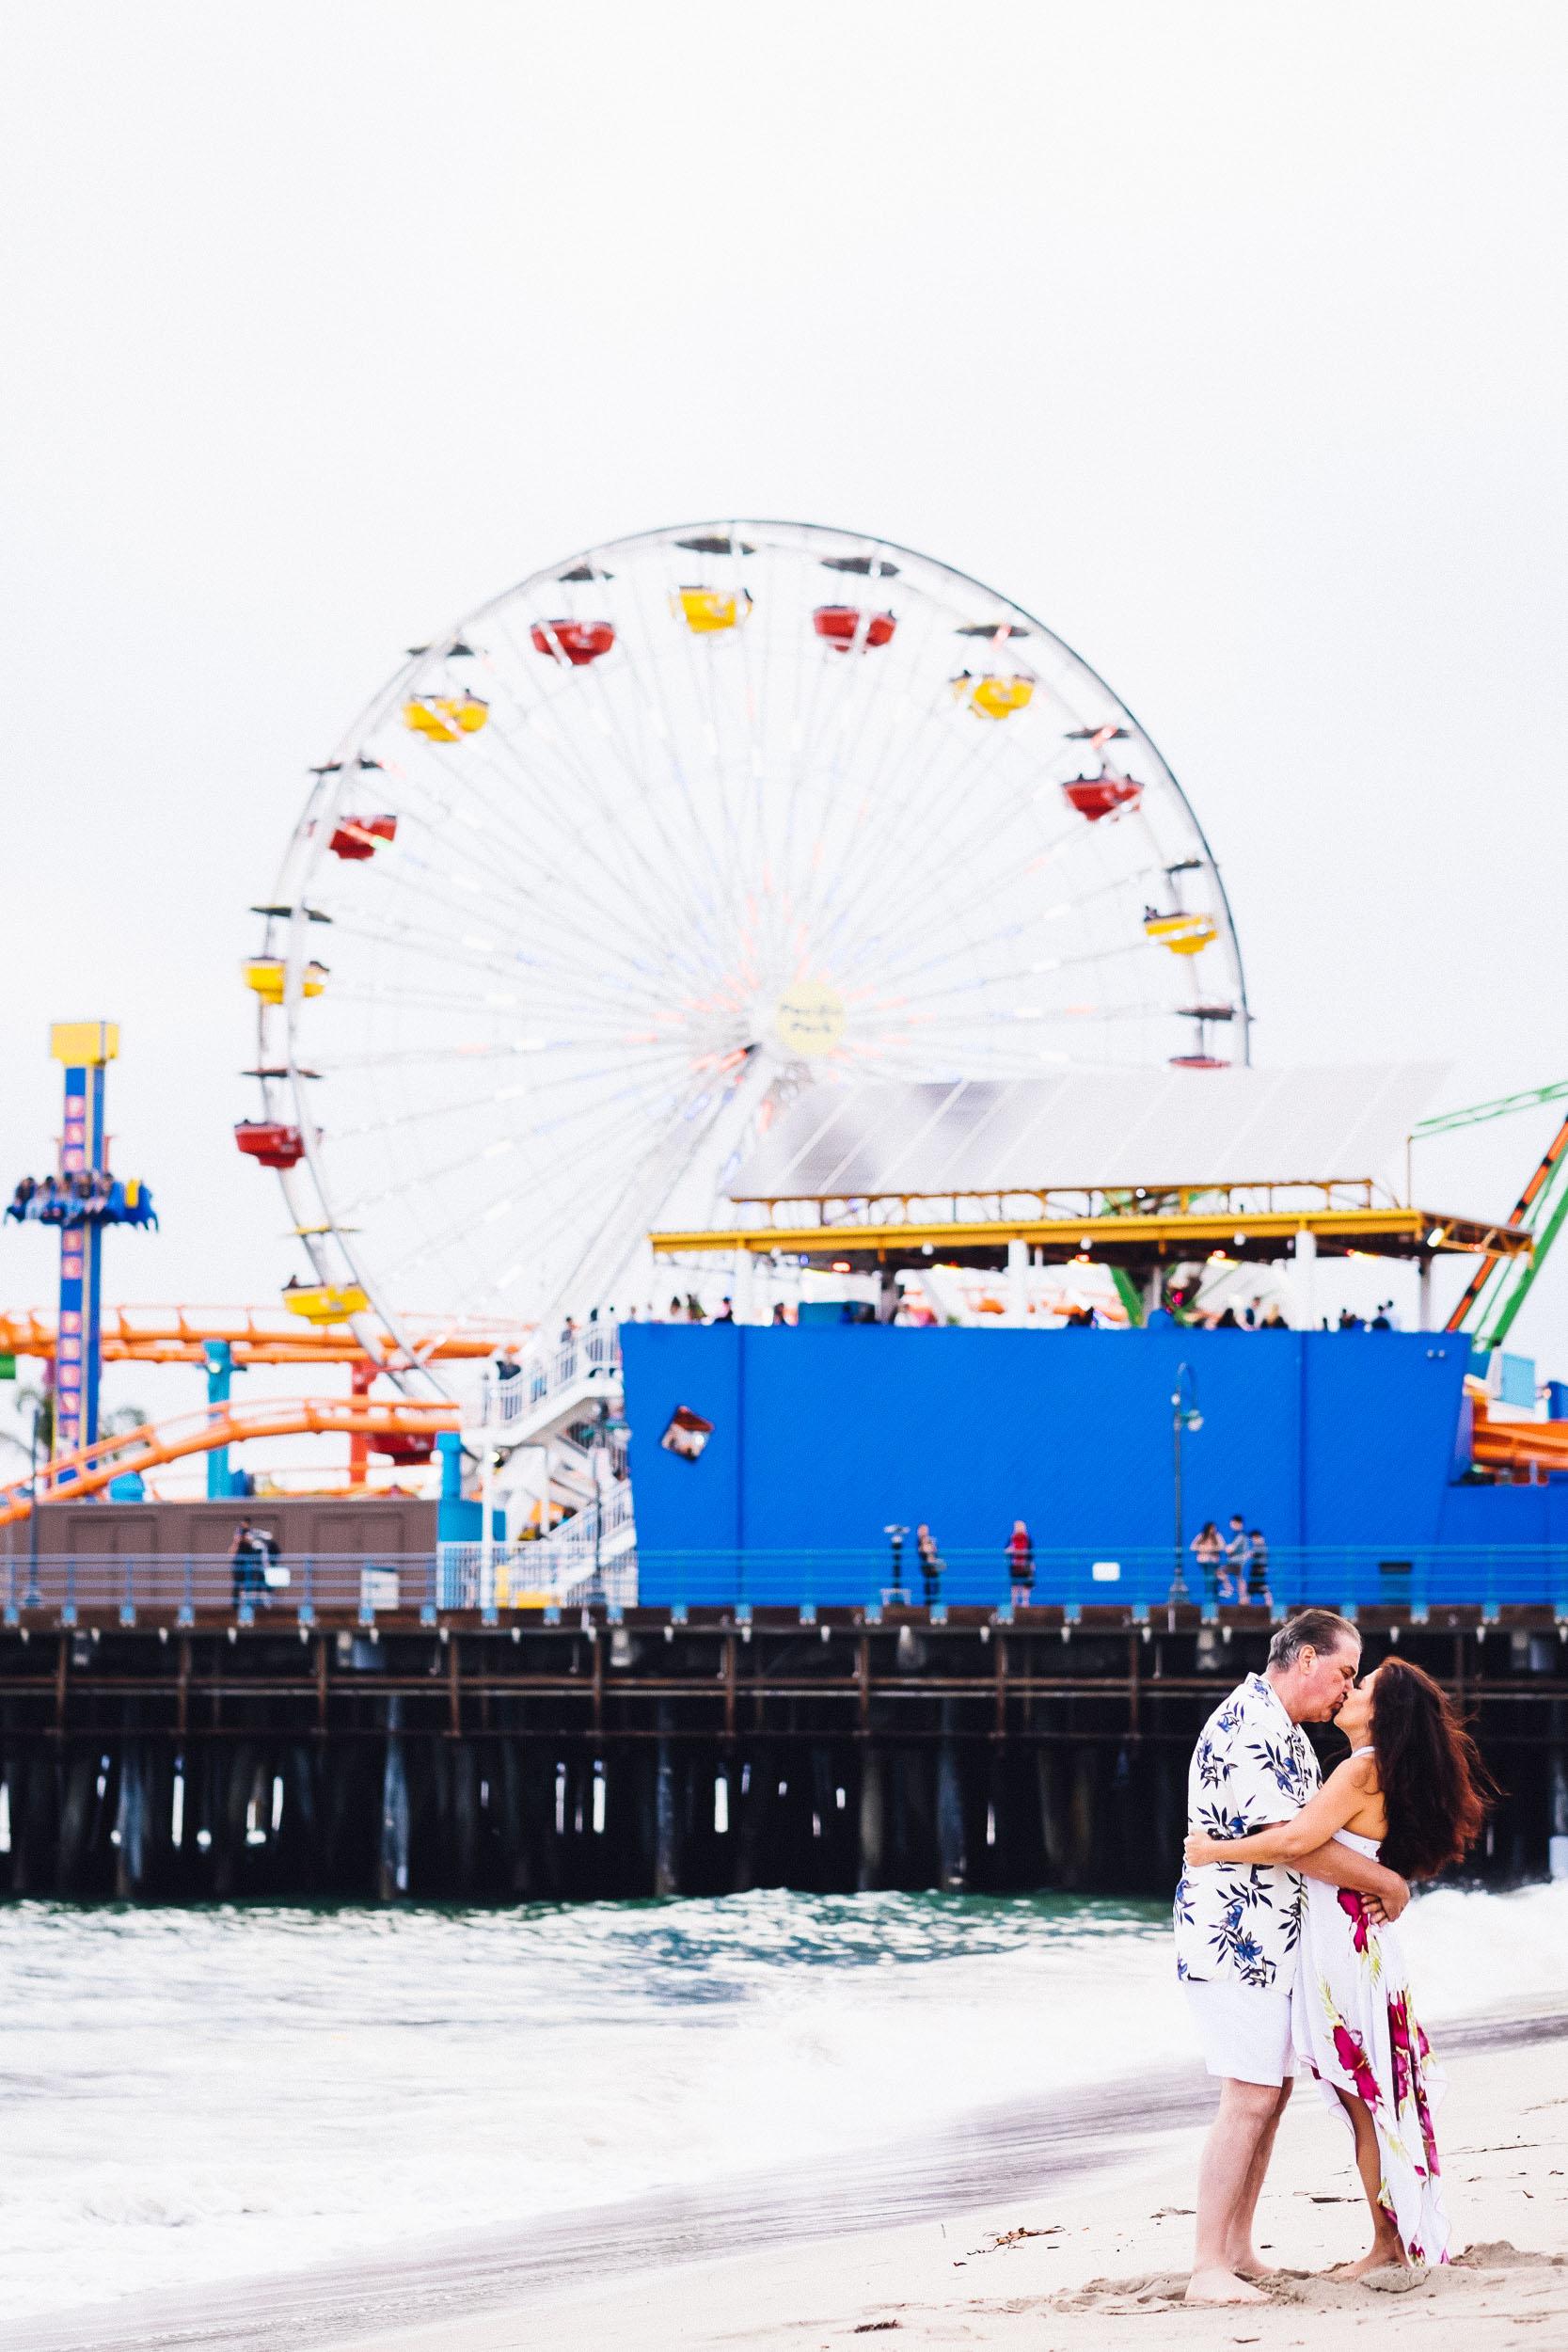 Bryan-Miraflor-Photography-Rose-Engagement-Photoshoot-20150613-0209.jpg